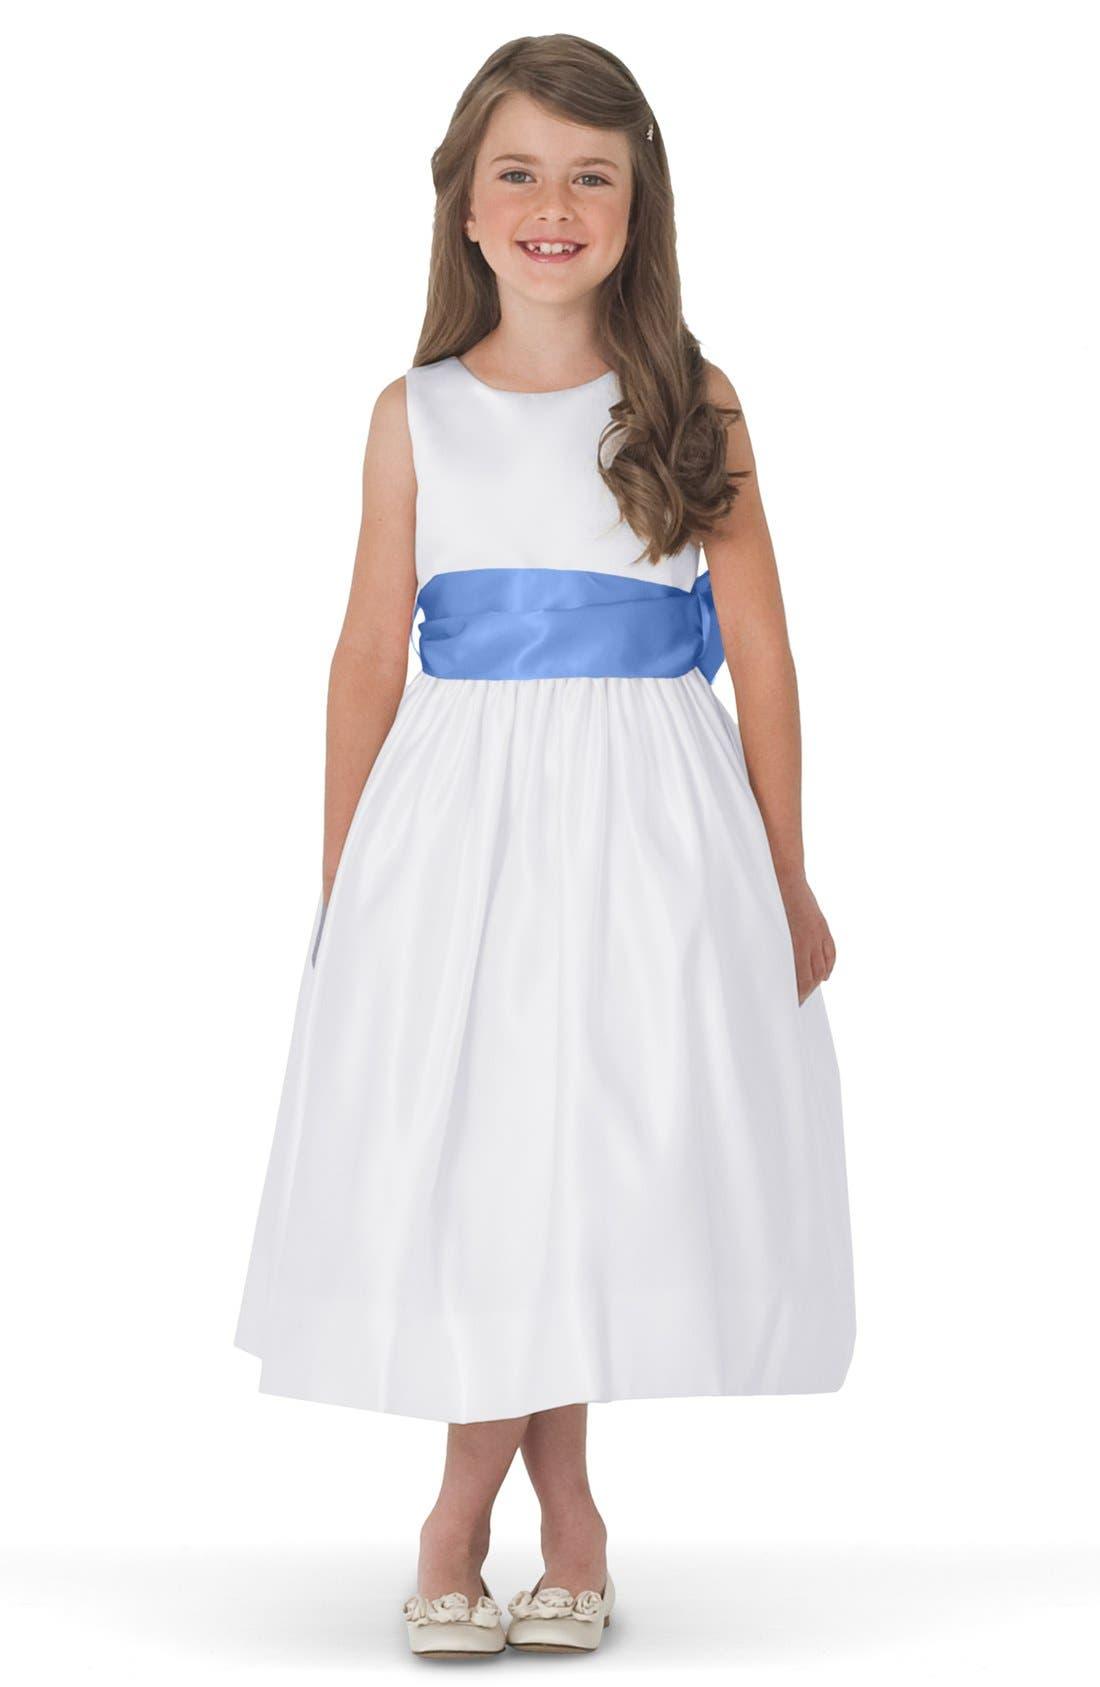 Alternate Image 1 Selected - Us Angels White Tank Dress with Satin Sash (Toddler, Little Girls & Big Girls)